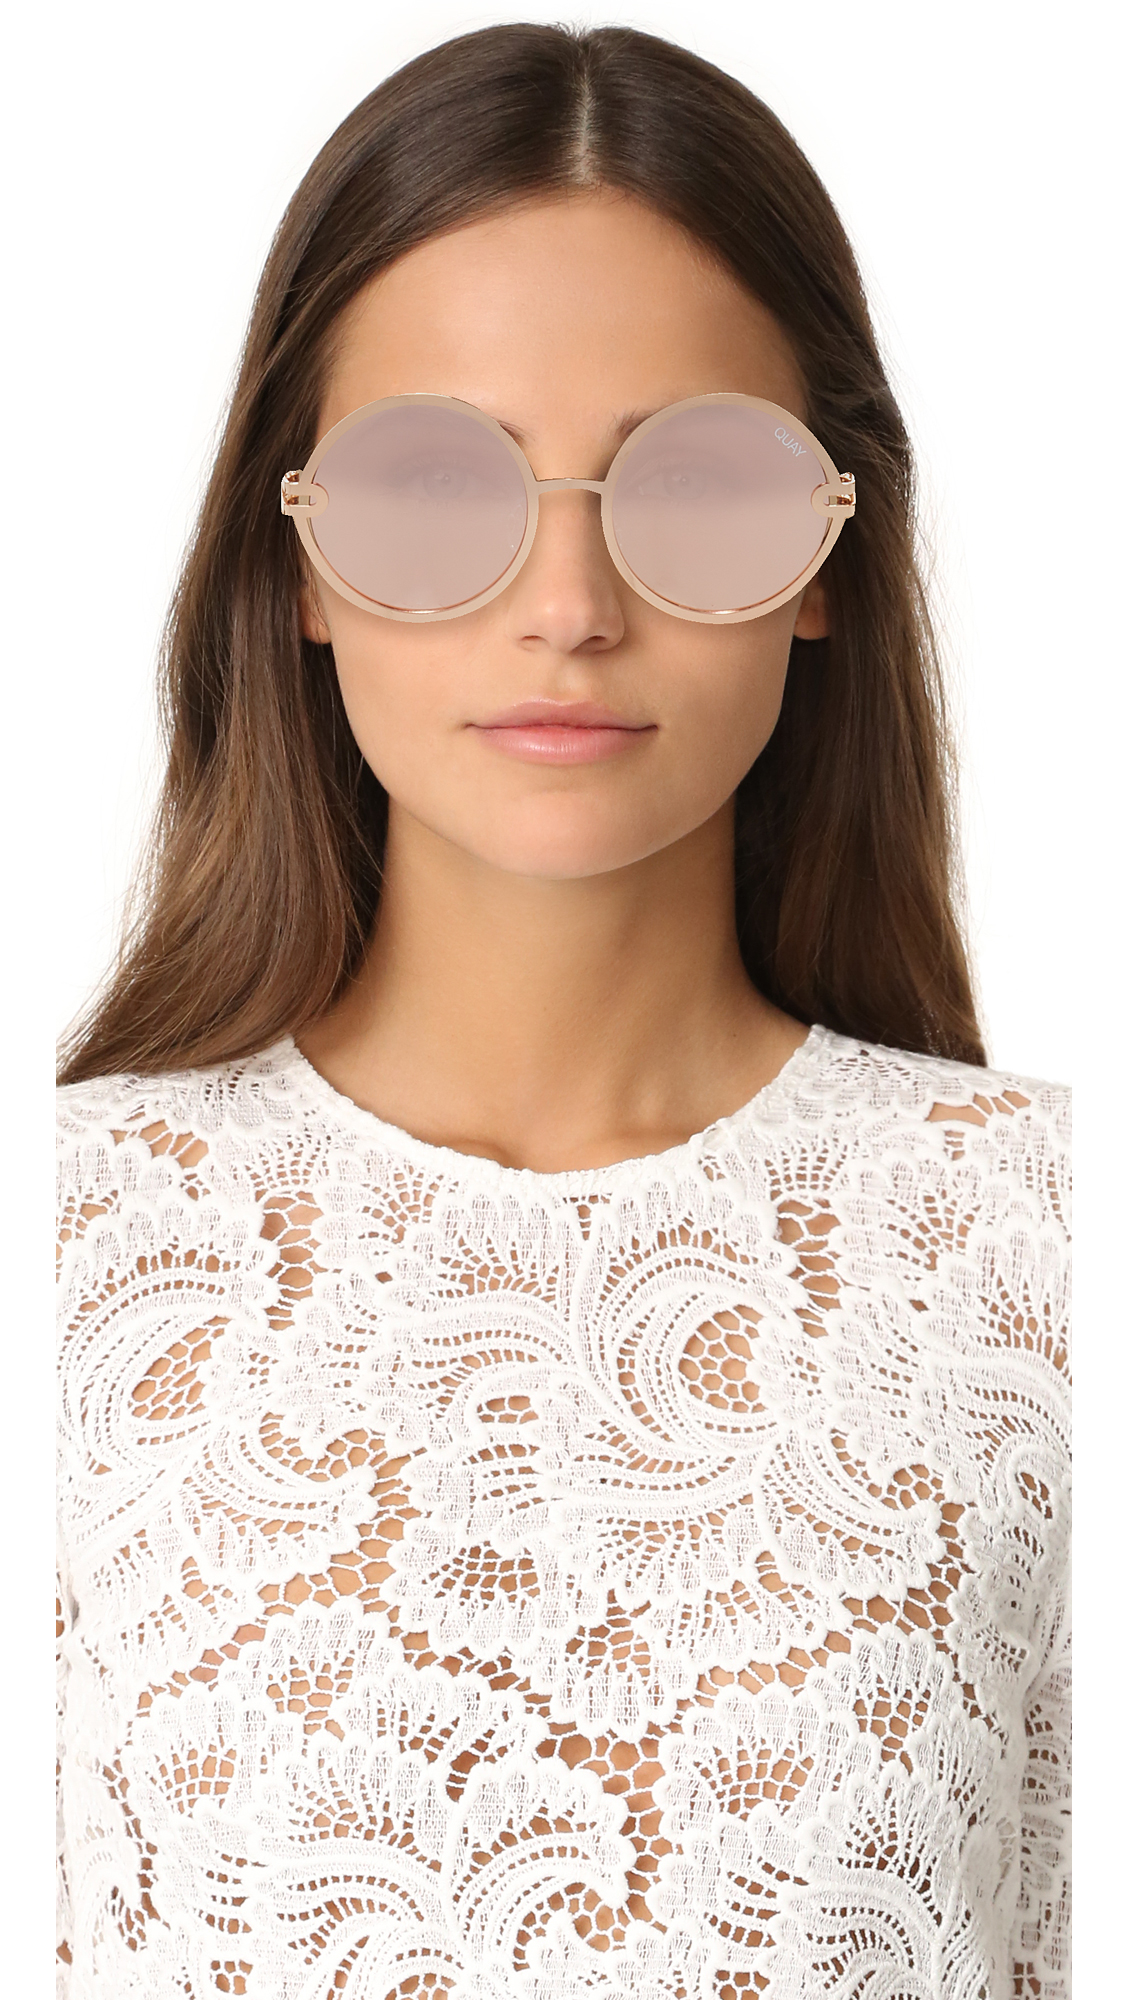 44b2384efbfb9 Quay Ukiyo Sunglasses